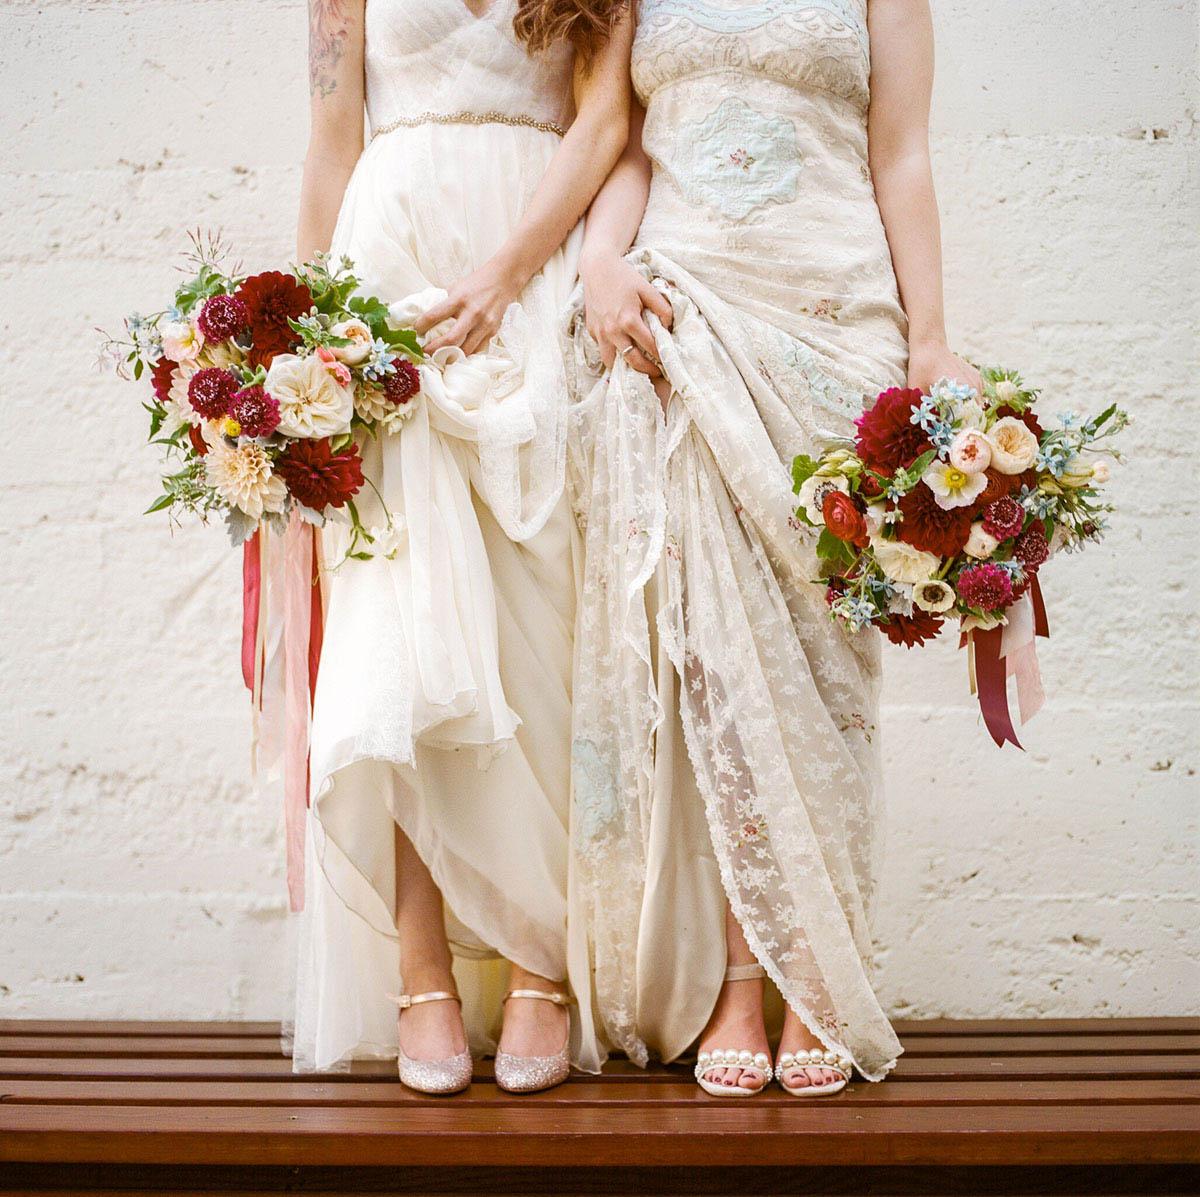 7-lesbian-wedding-bold-bouquet.jpg